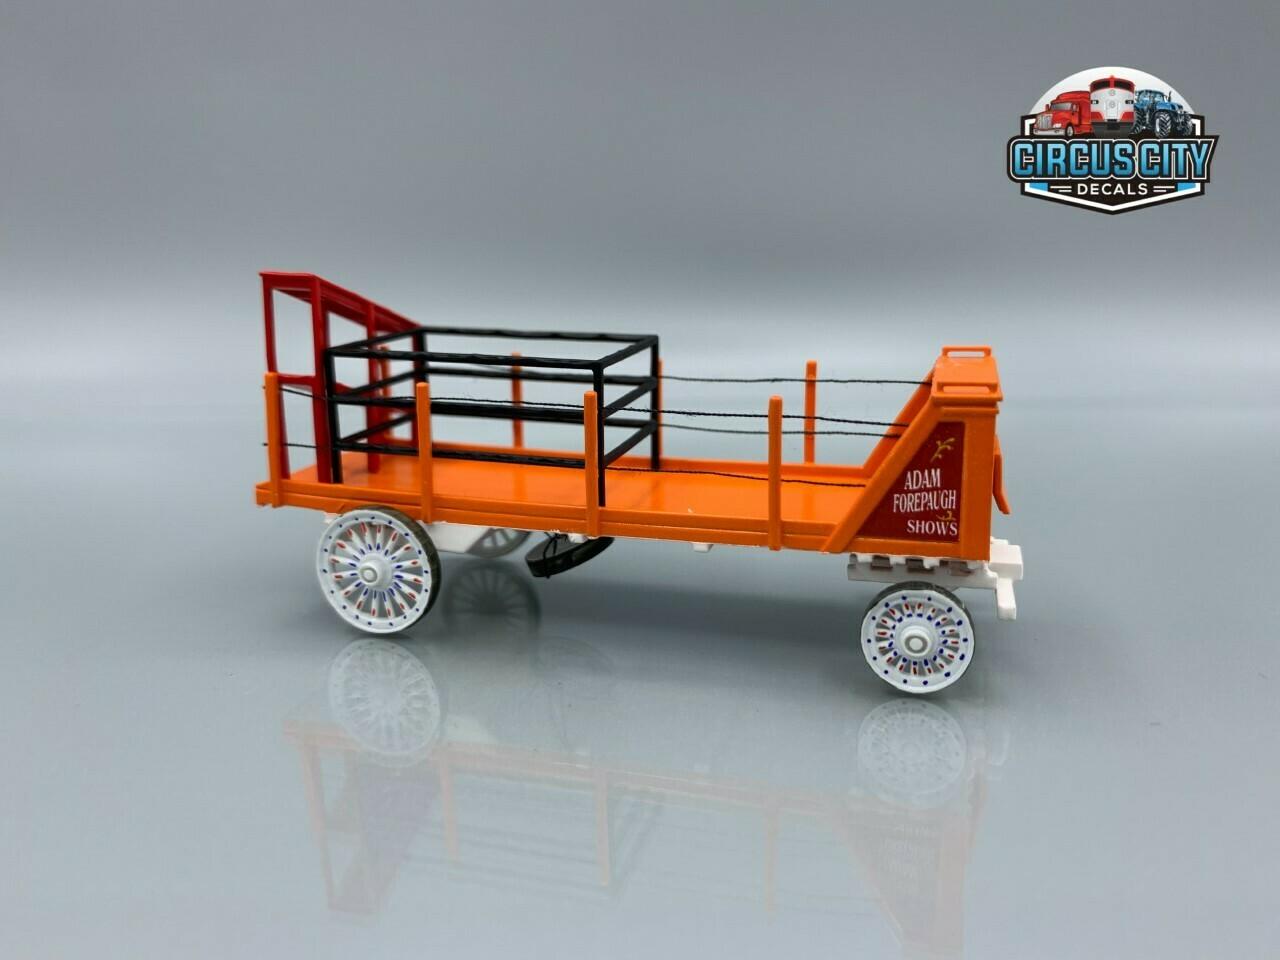 Adam Forepaugh Shows Stringer Wagon Kit HO Scale